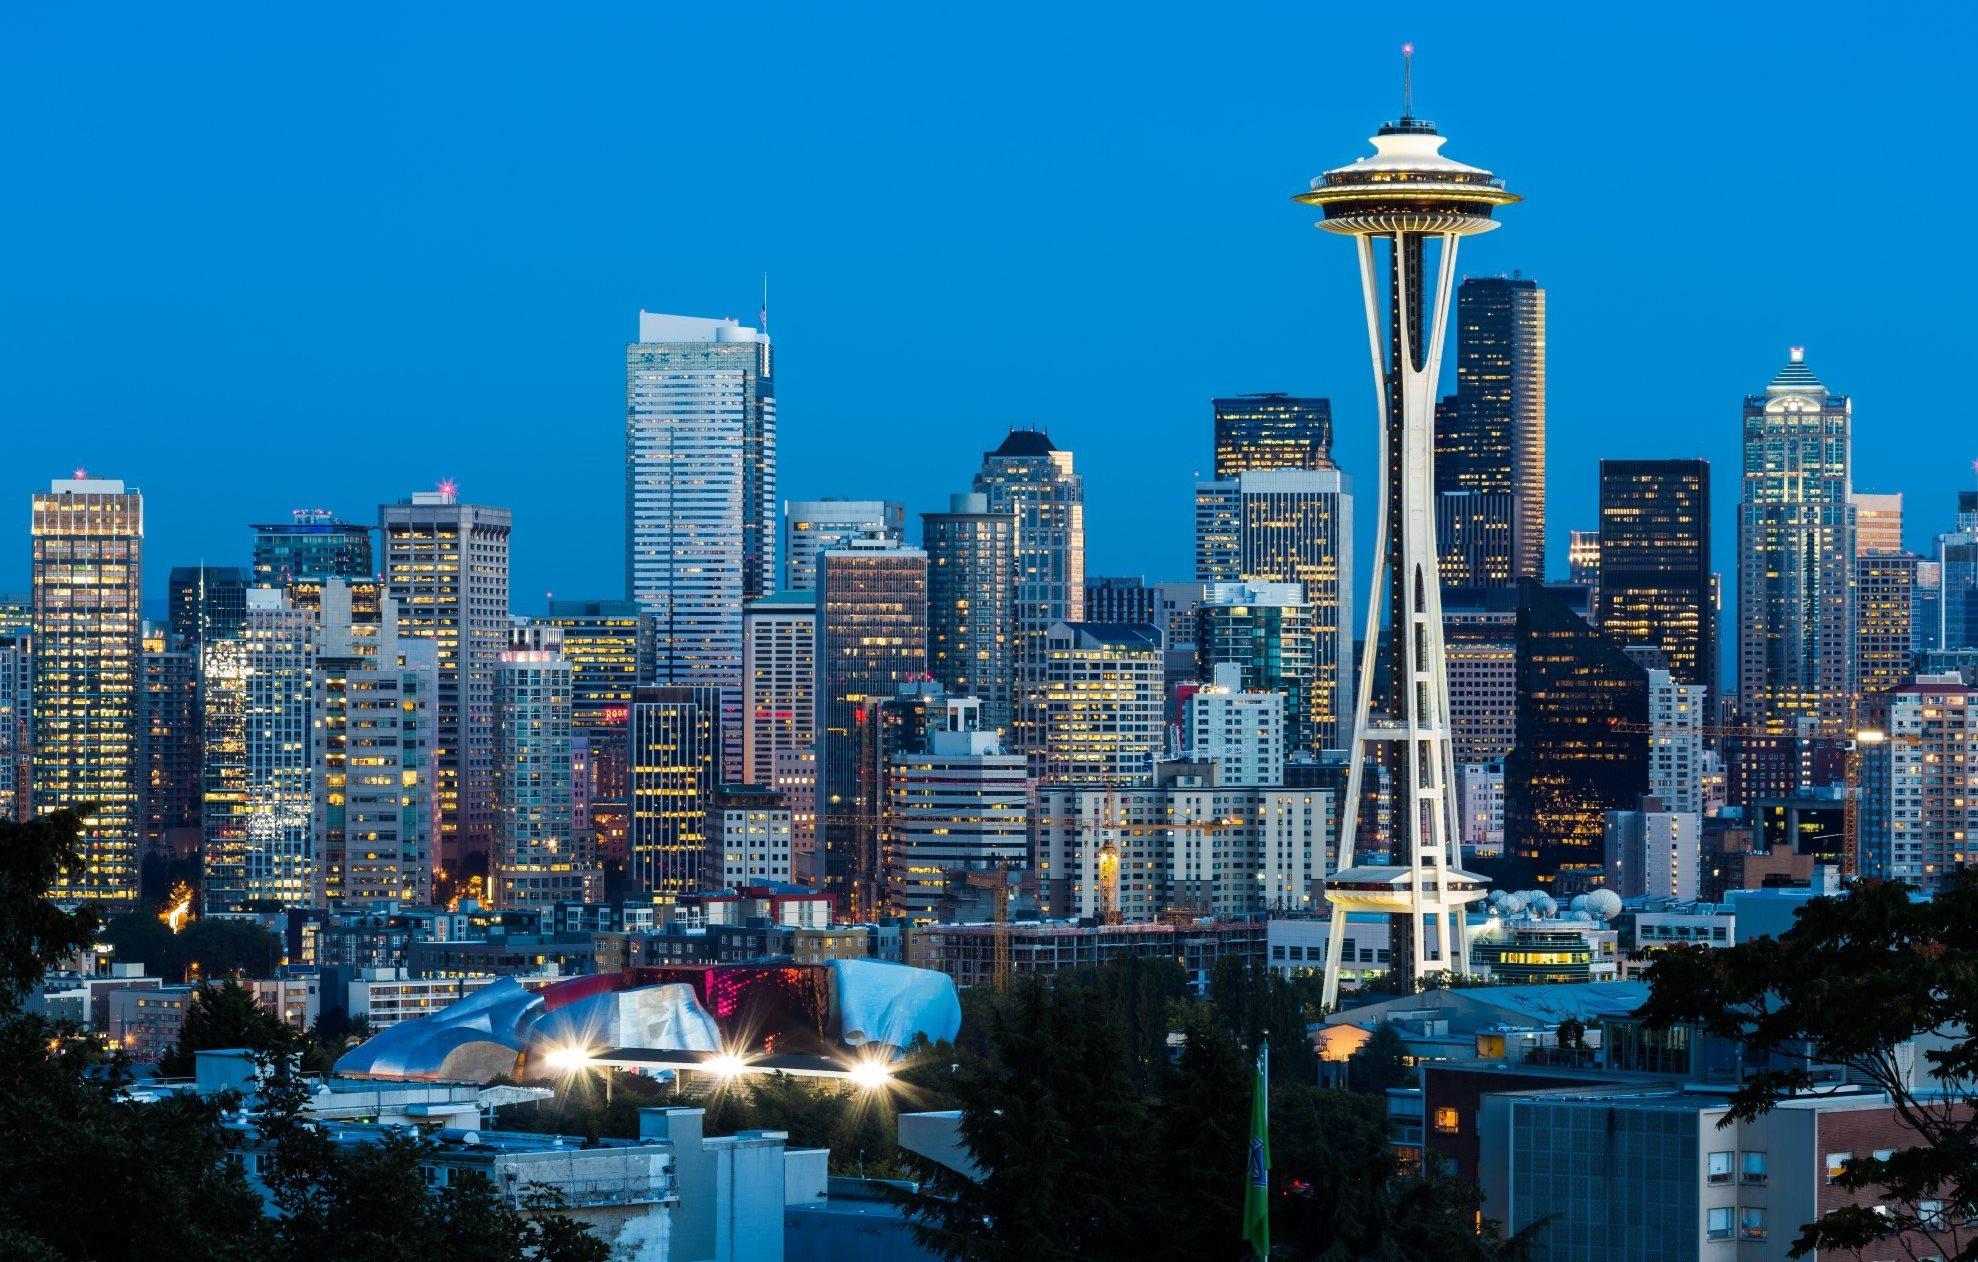 City Skyline View of Downtown Seattle, Washington